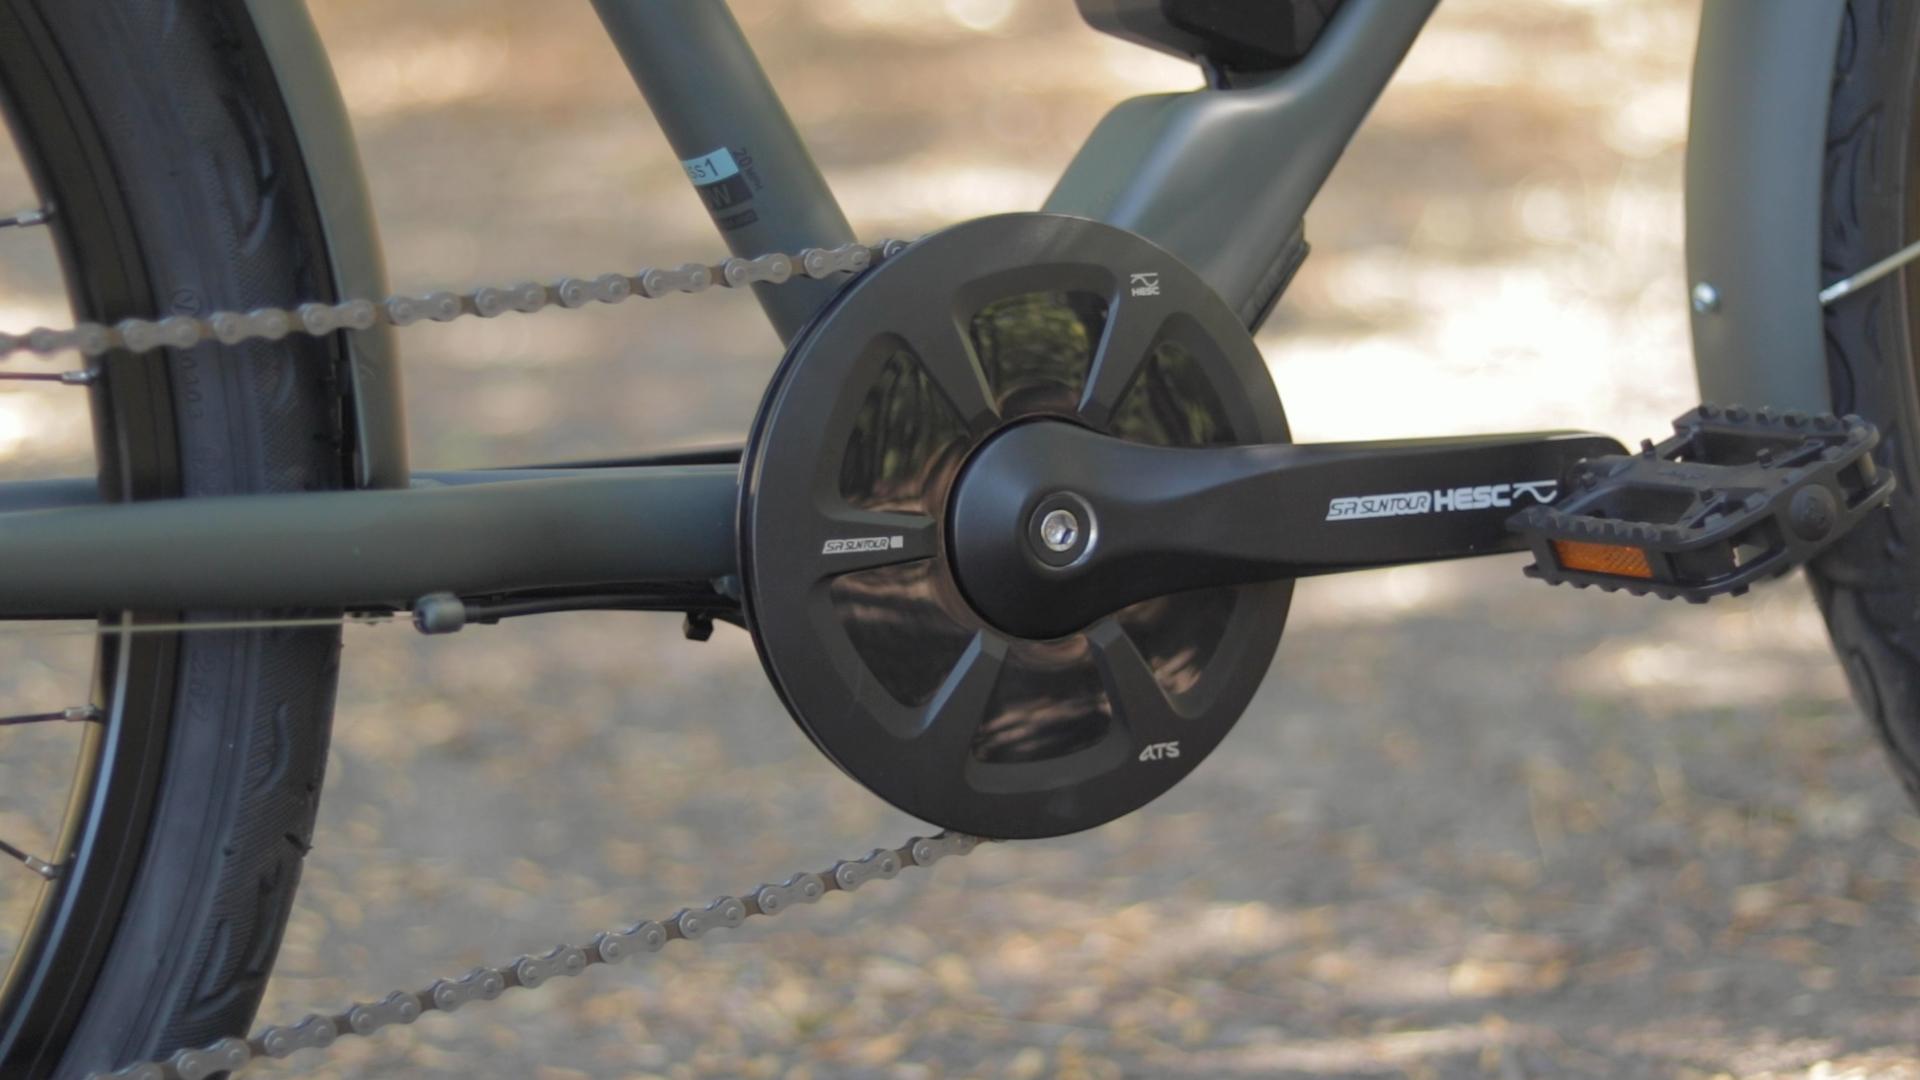 electrified-reviews-izip-simi-electric-bike-review-suntour-hesc-cranks.jpg